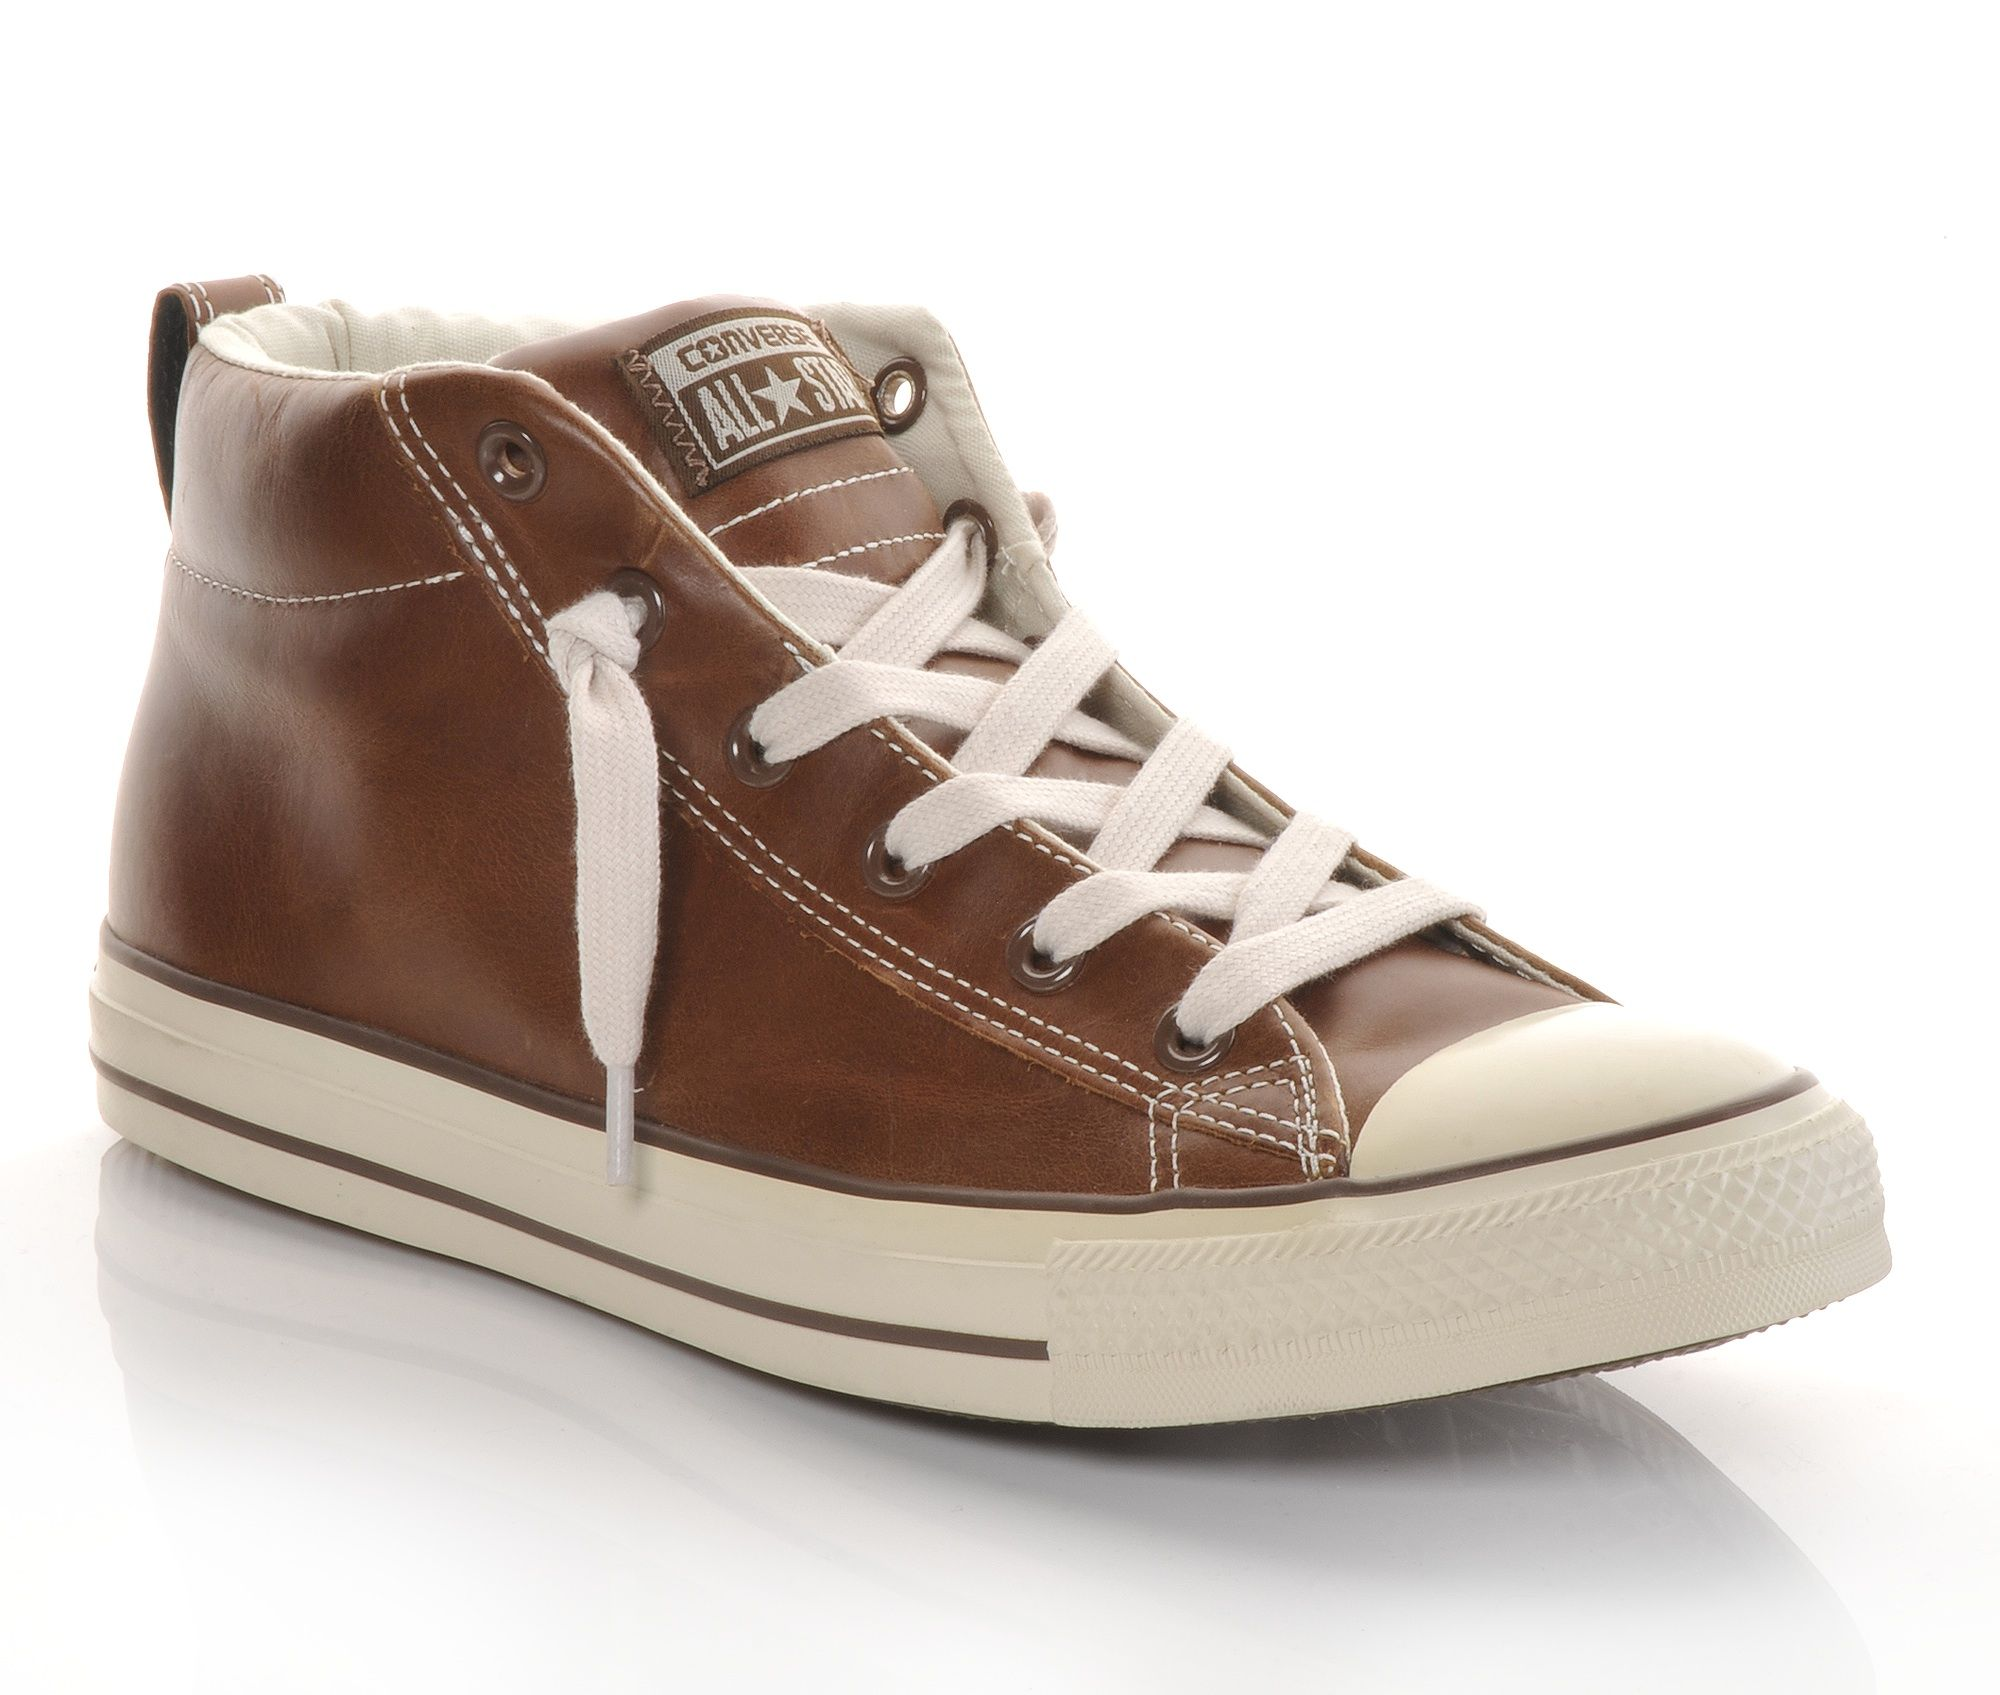 Converse men, Leather converse, Leather